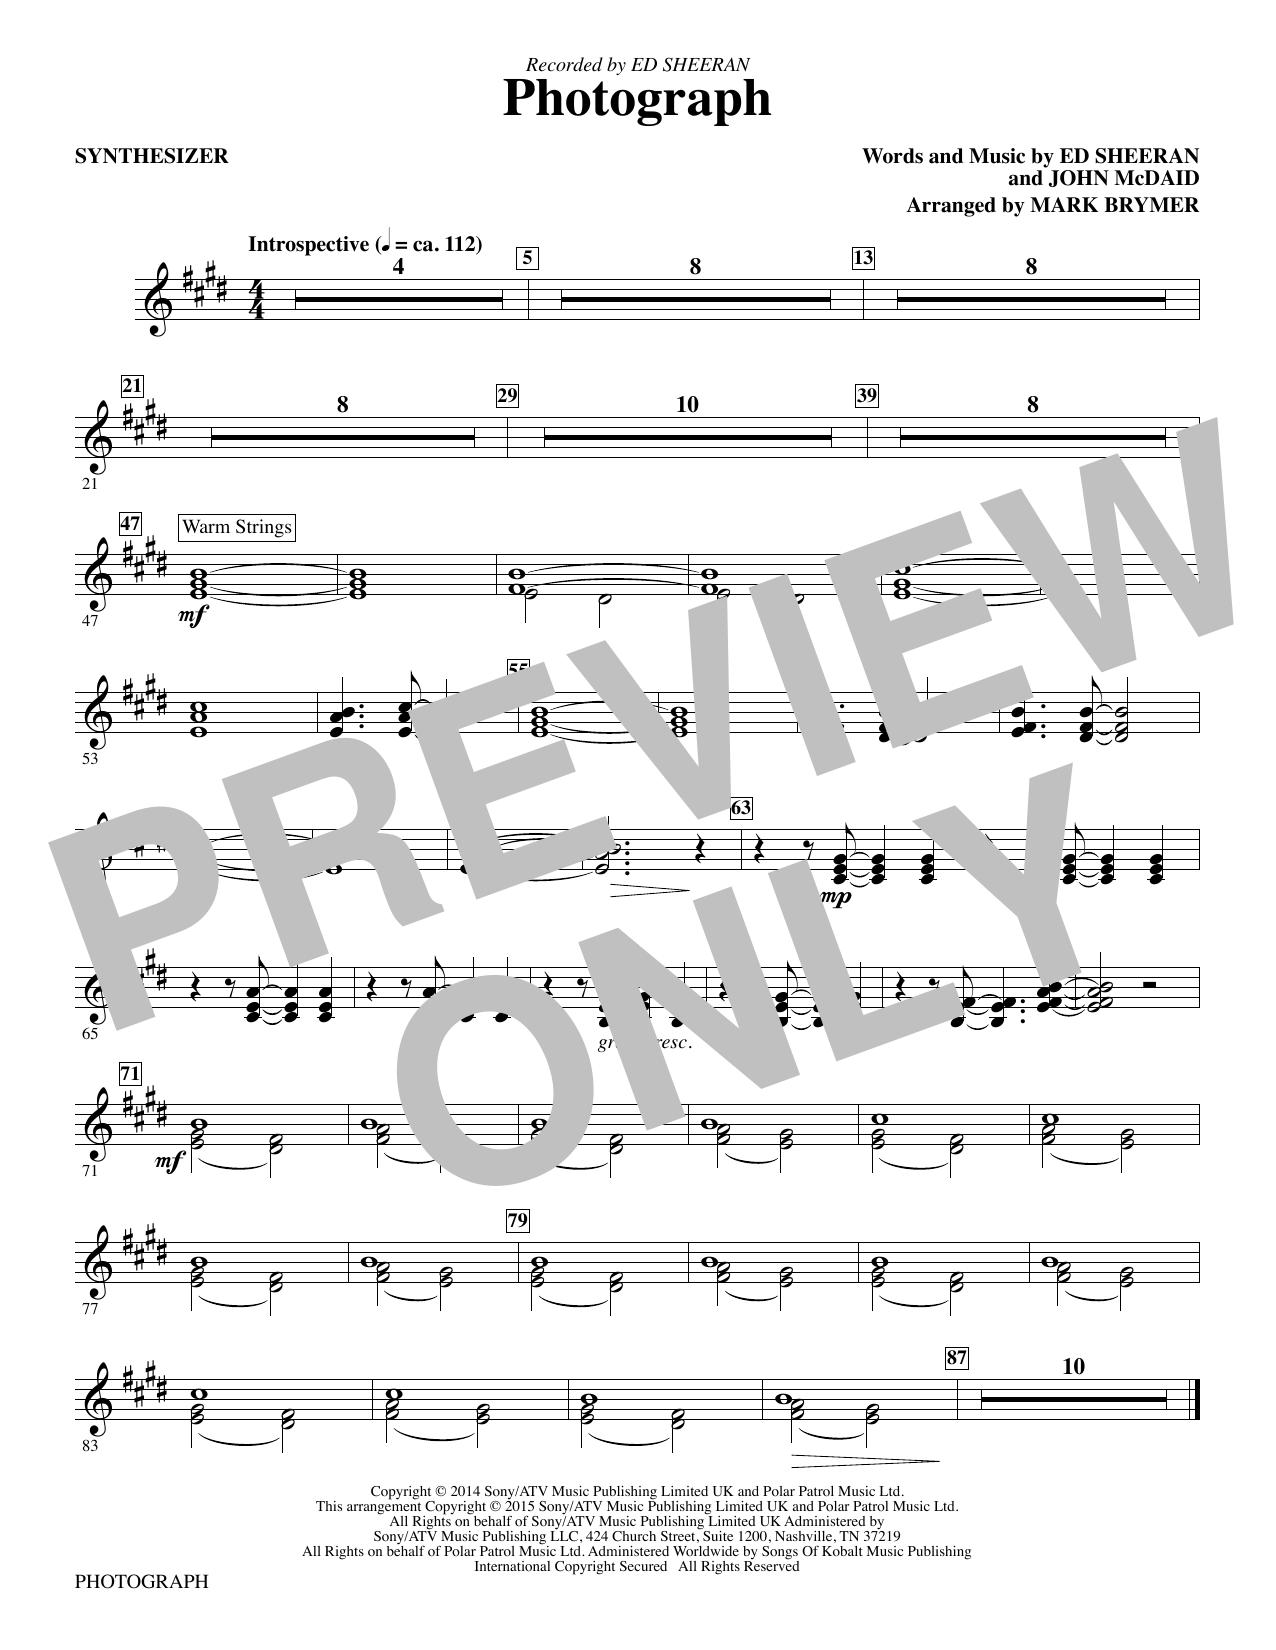 Photograph - Synthesizer sheet music